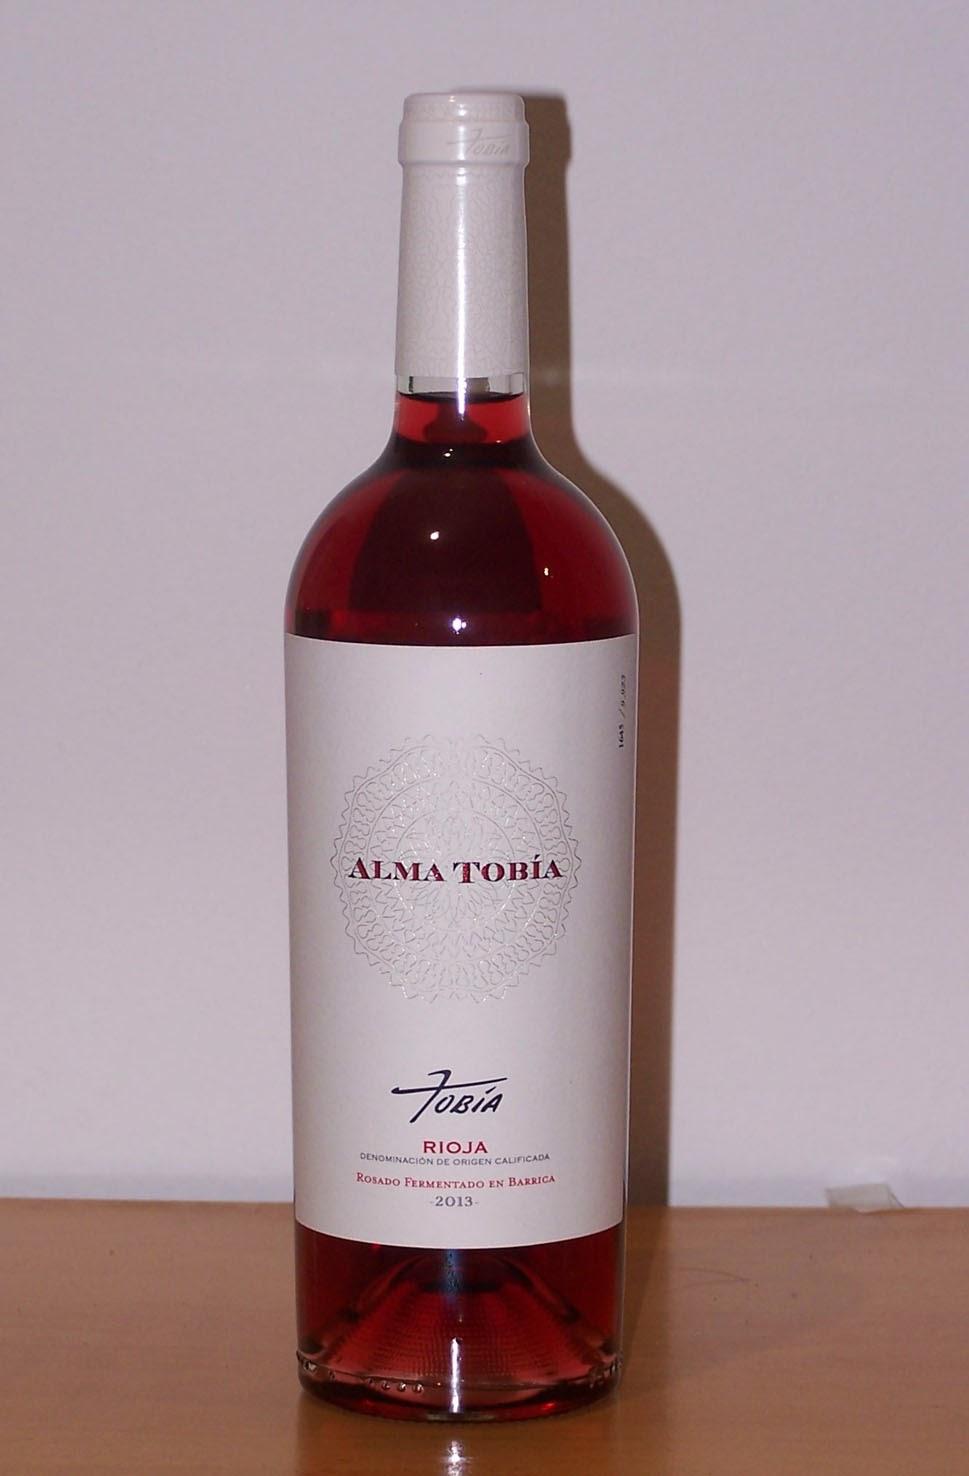 Alma de Tobía Rosado 2012, D.o.c Rioja